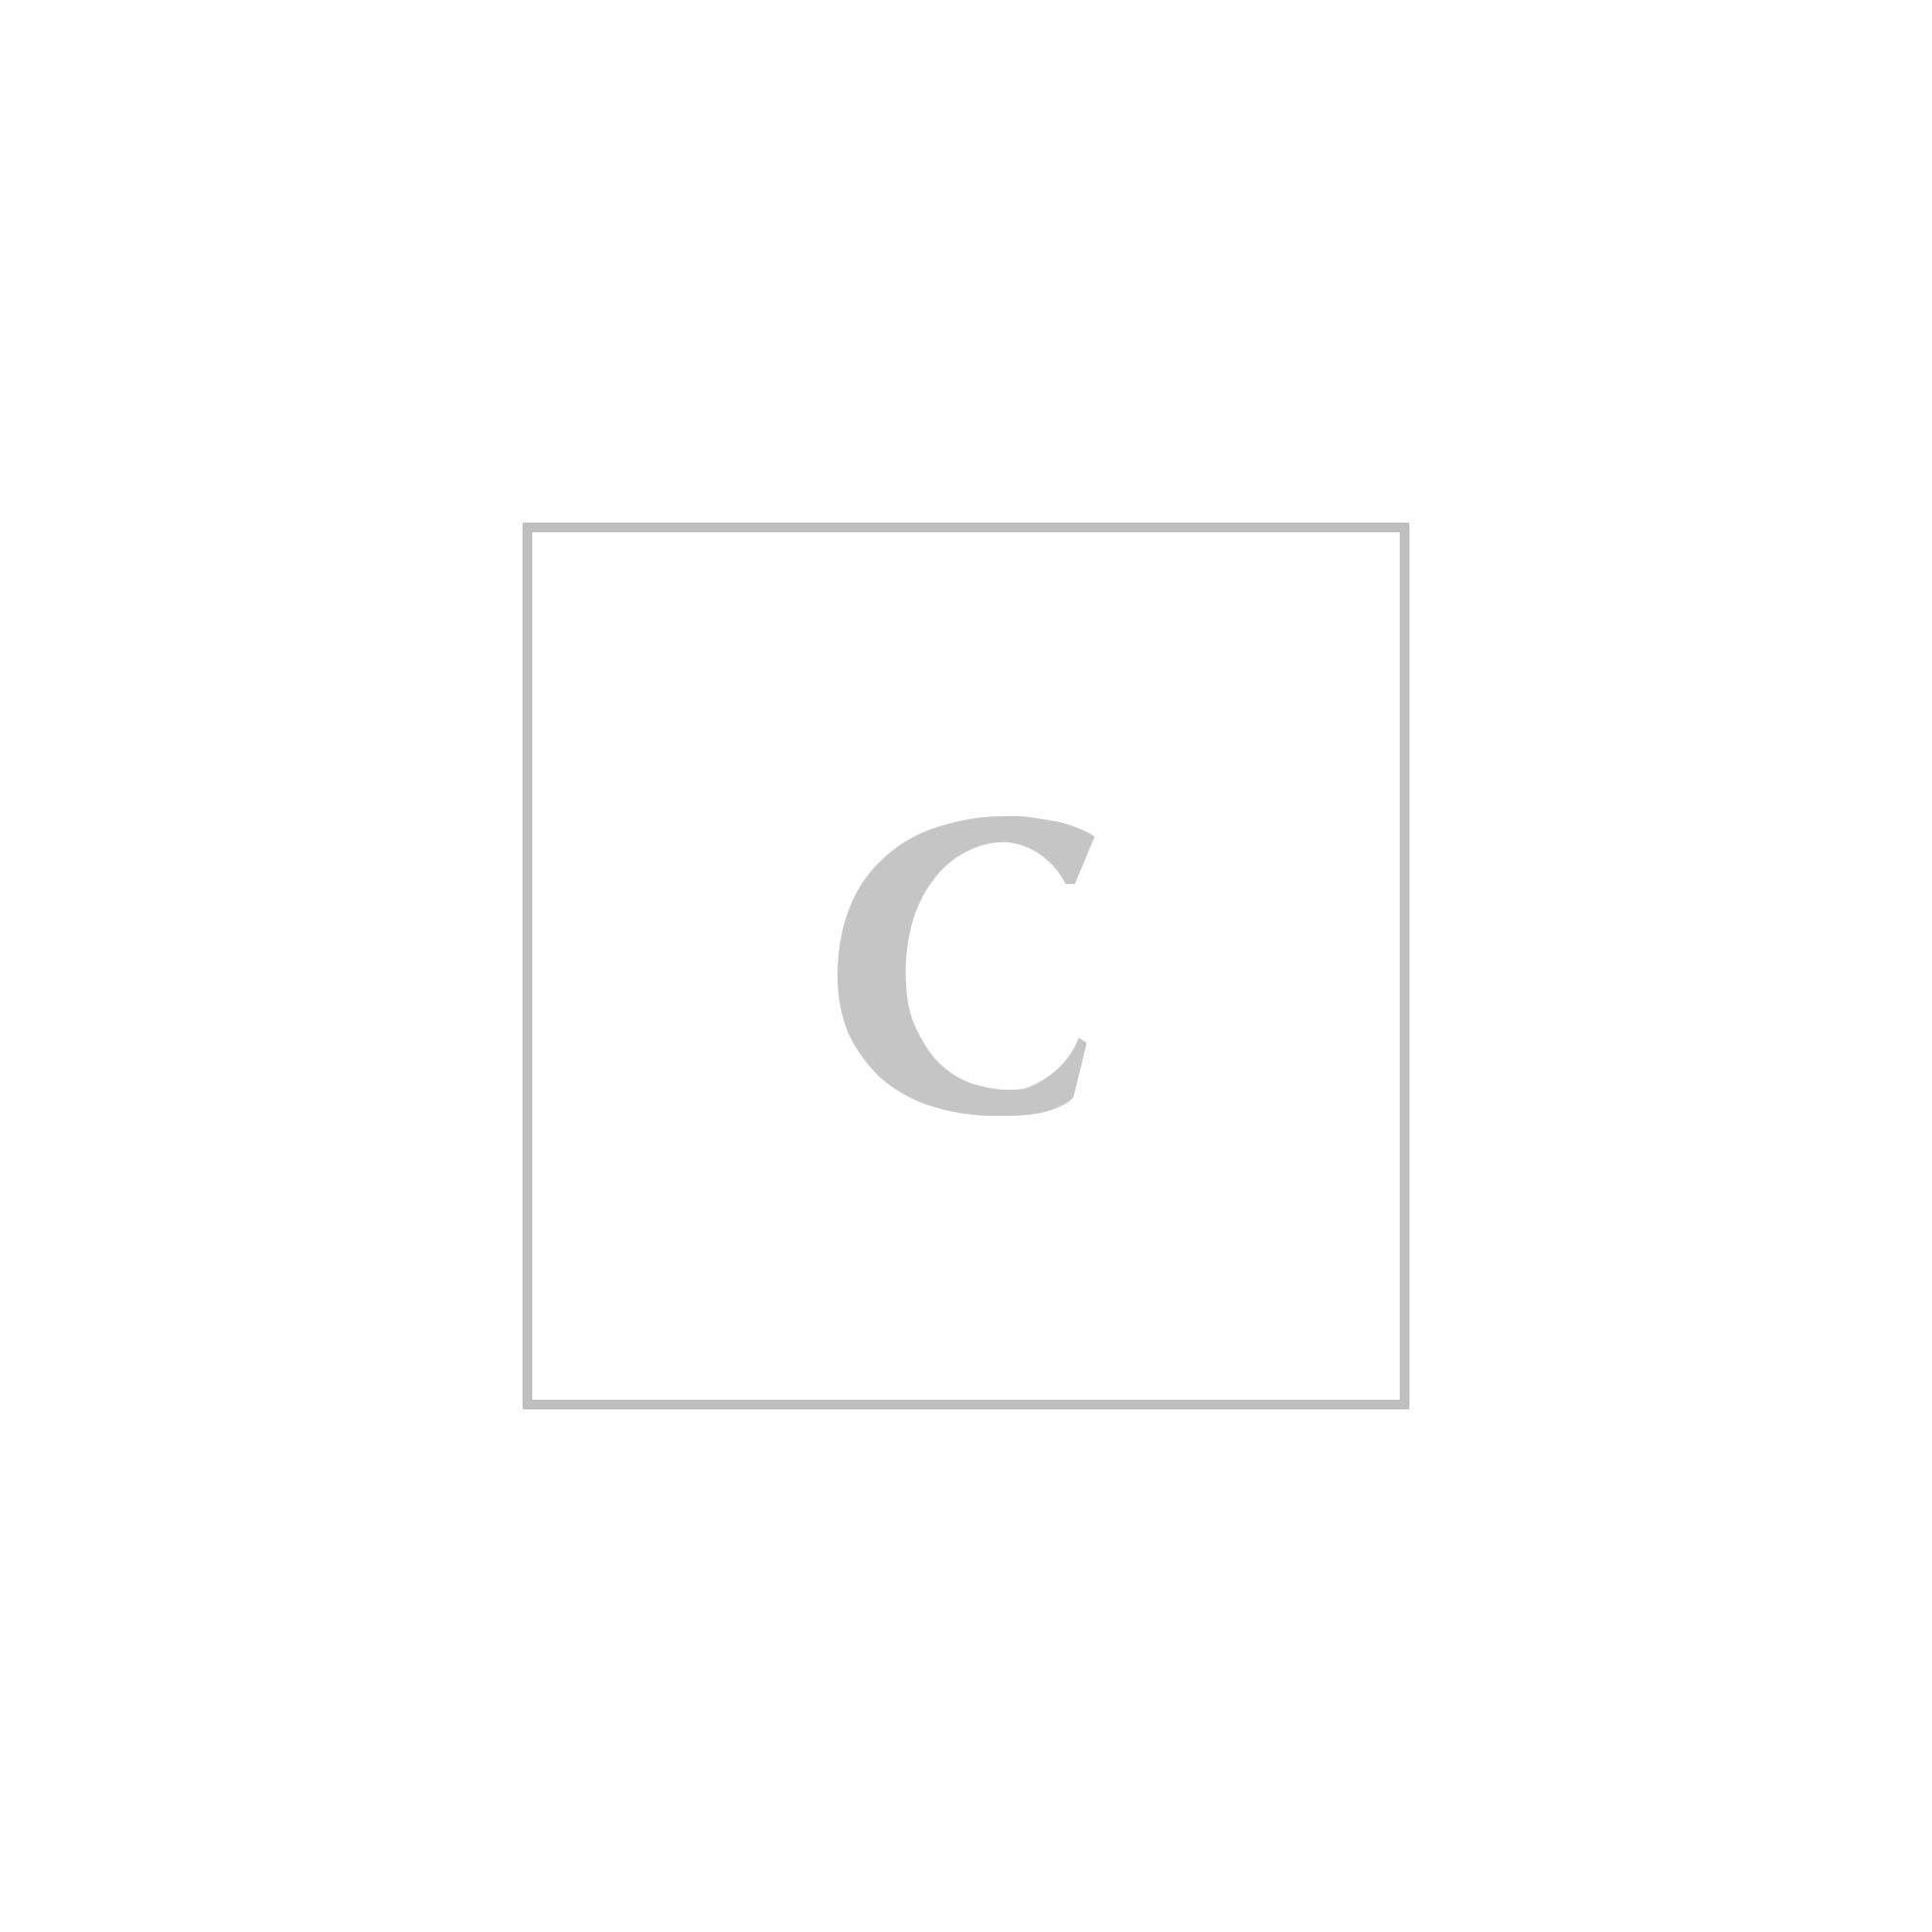 Dolce & gabbana slingback nappa+chantilly